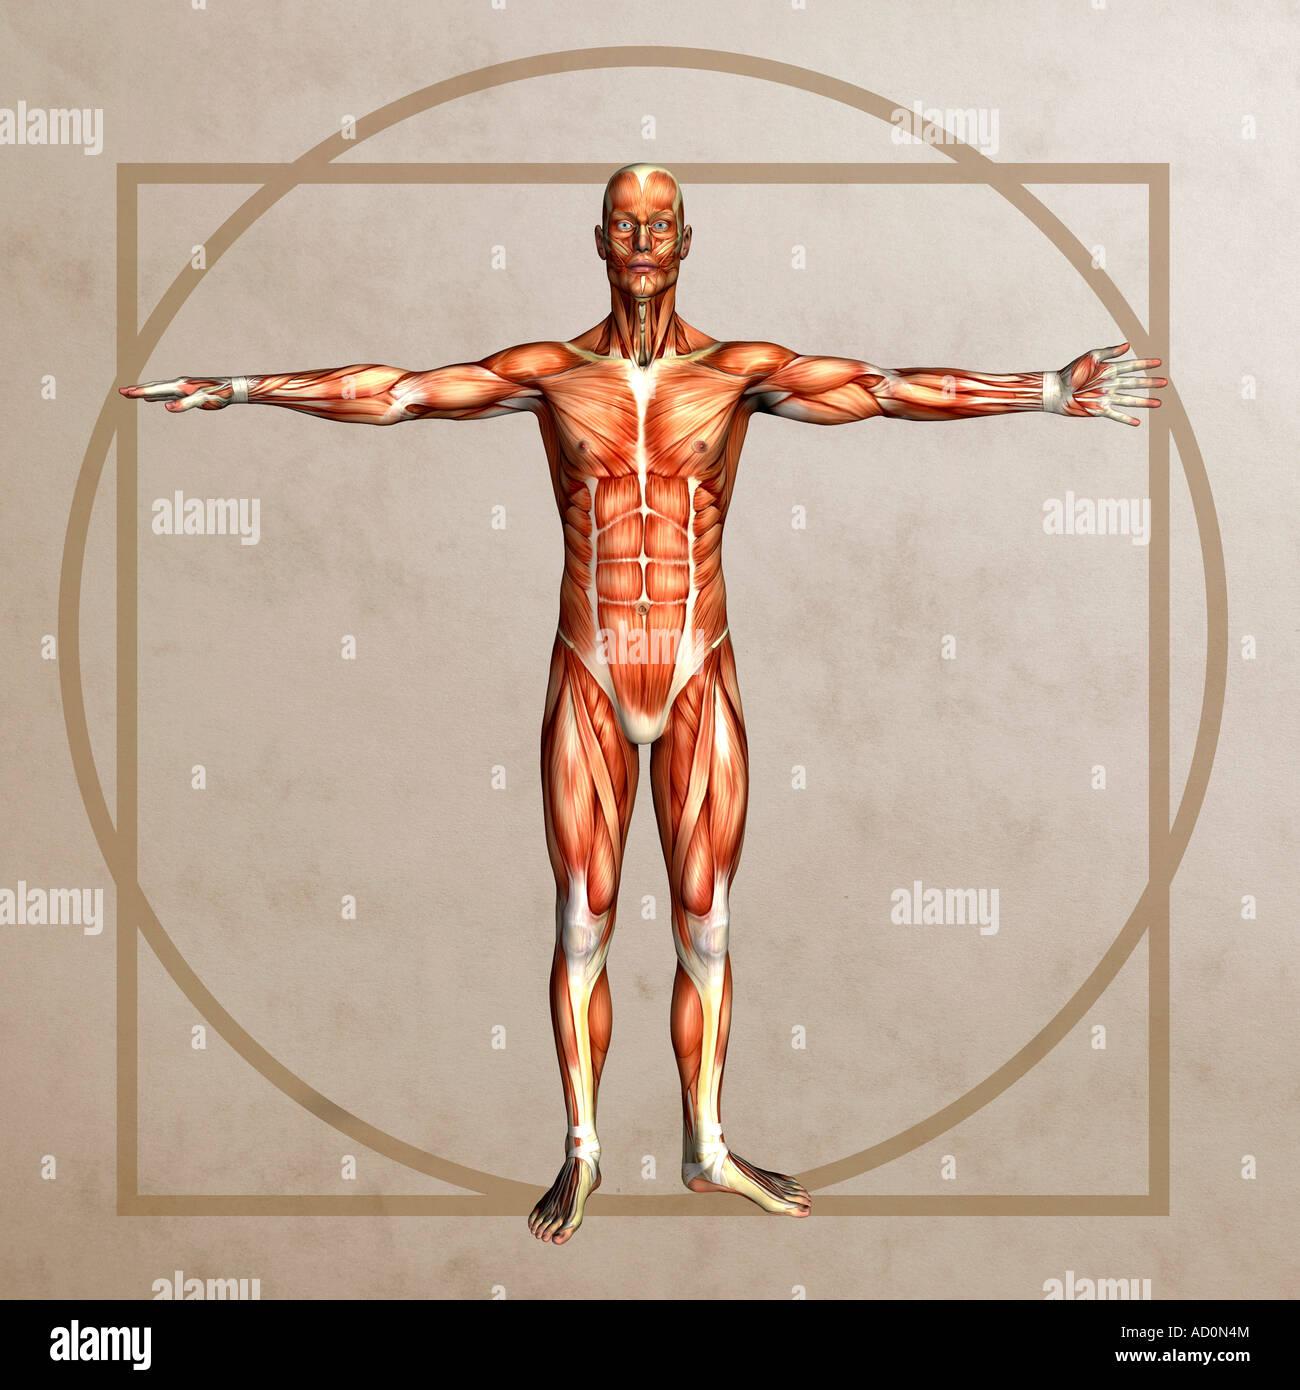 Vitruvian Man Muscles Stock Photos Vitruvian Man Muscles Stock